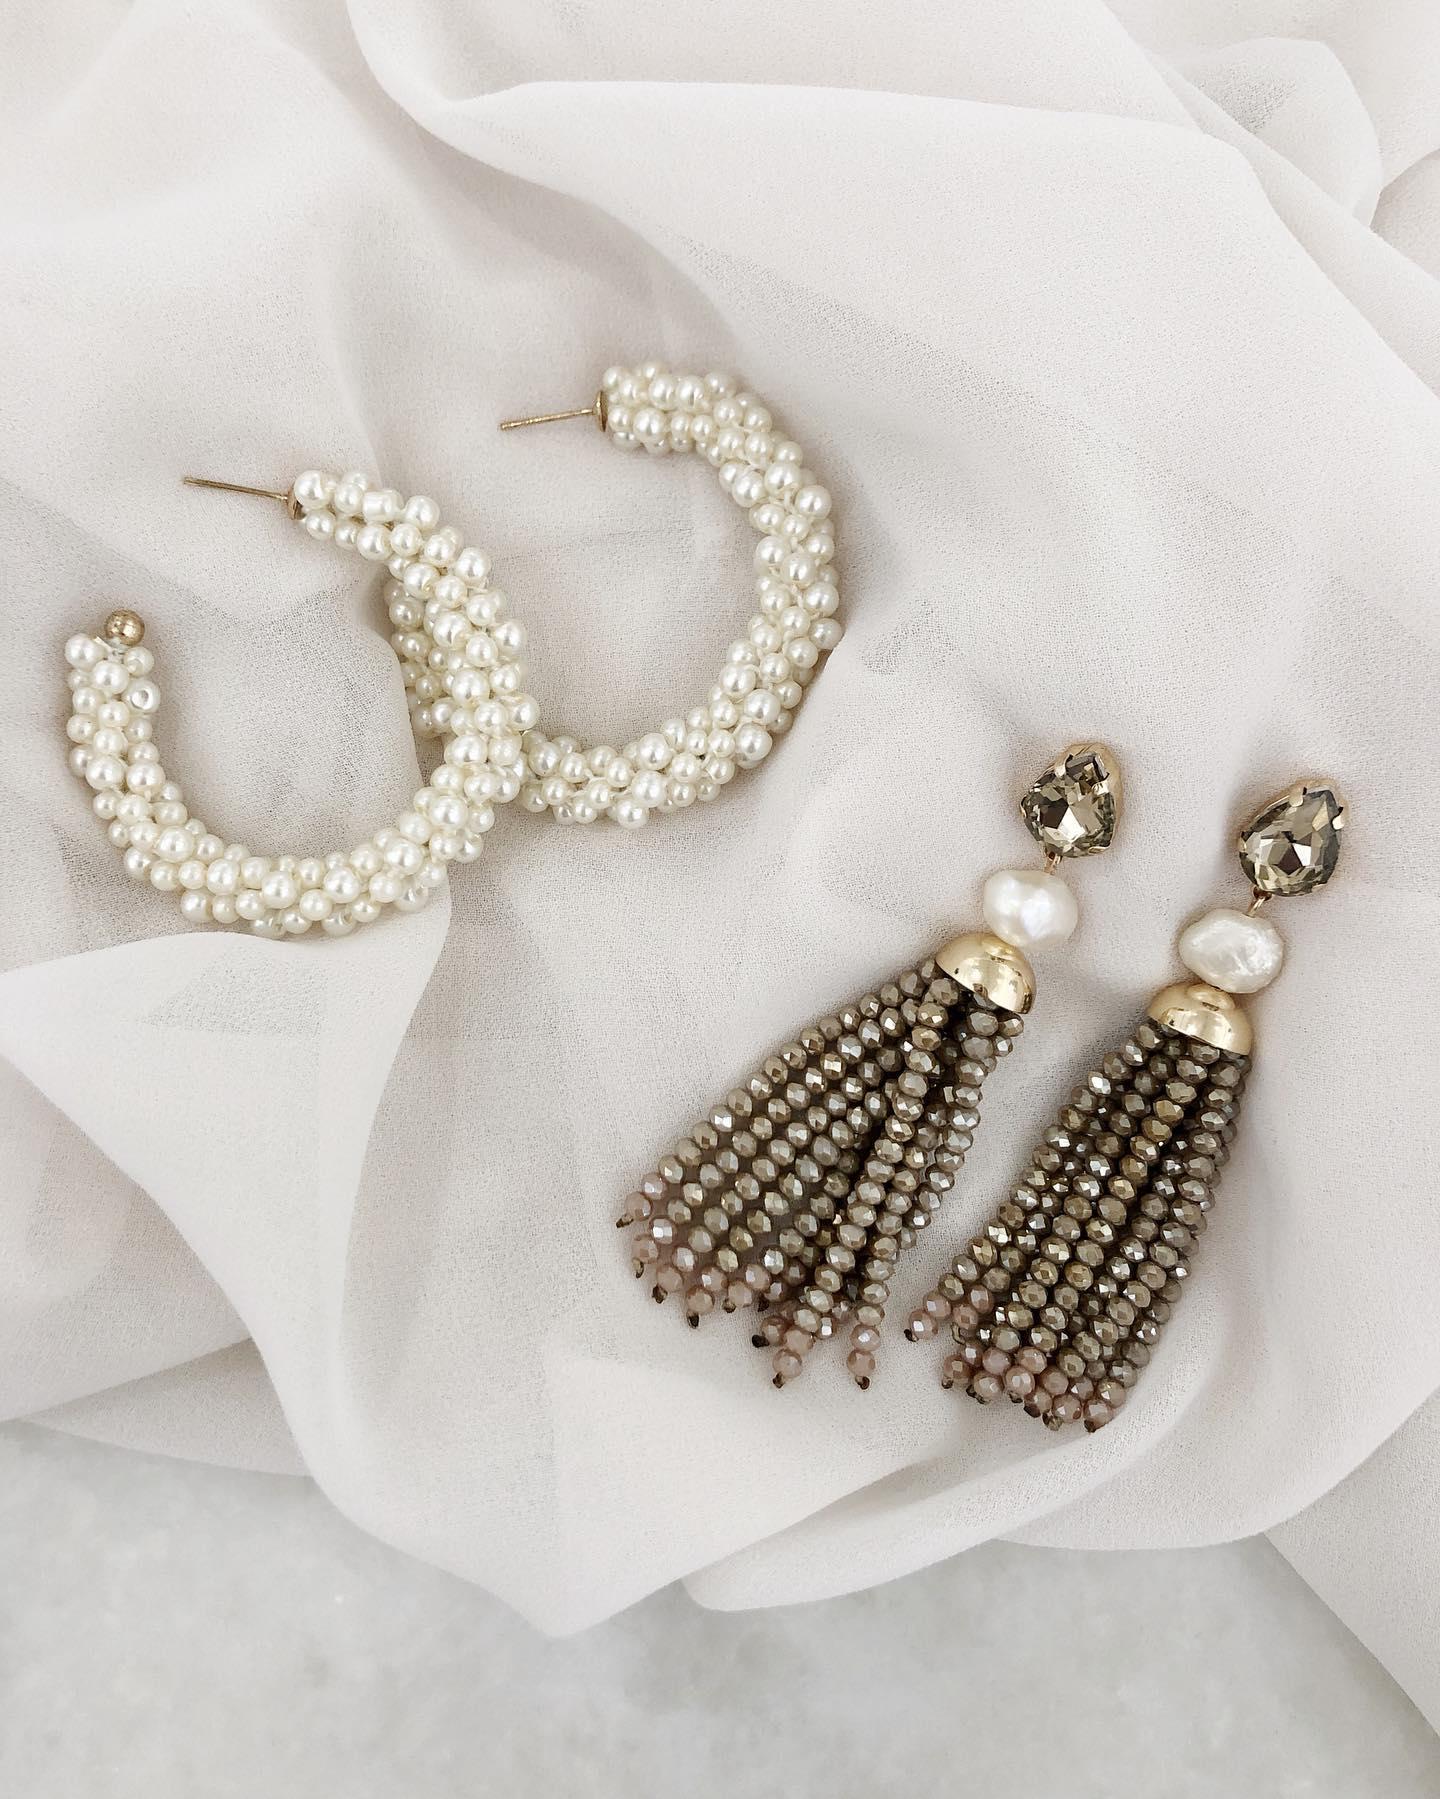 56fbe3b7bf Olive + Piper | Fashion Jewelry Boutique & Wedding Jewelry